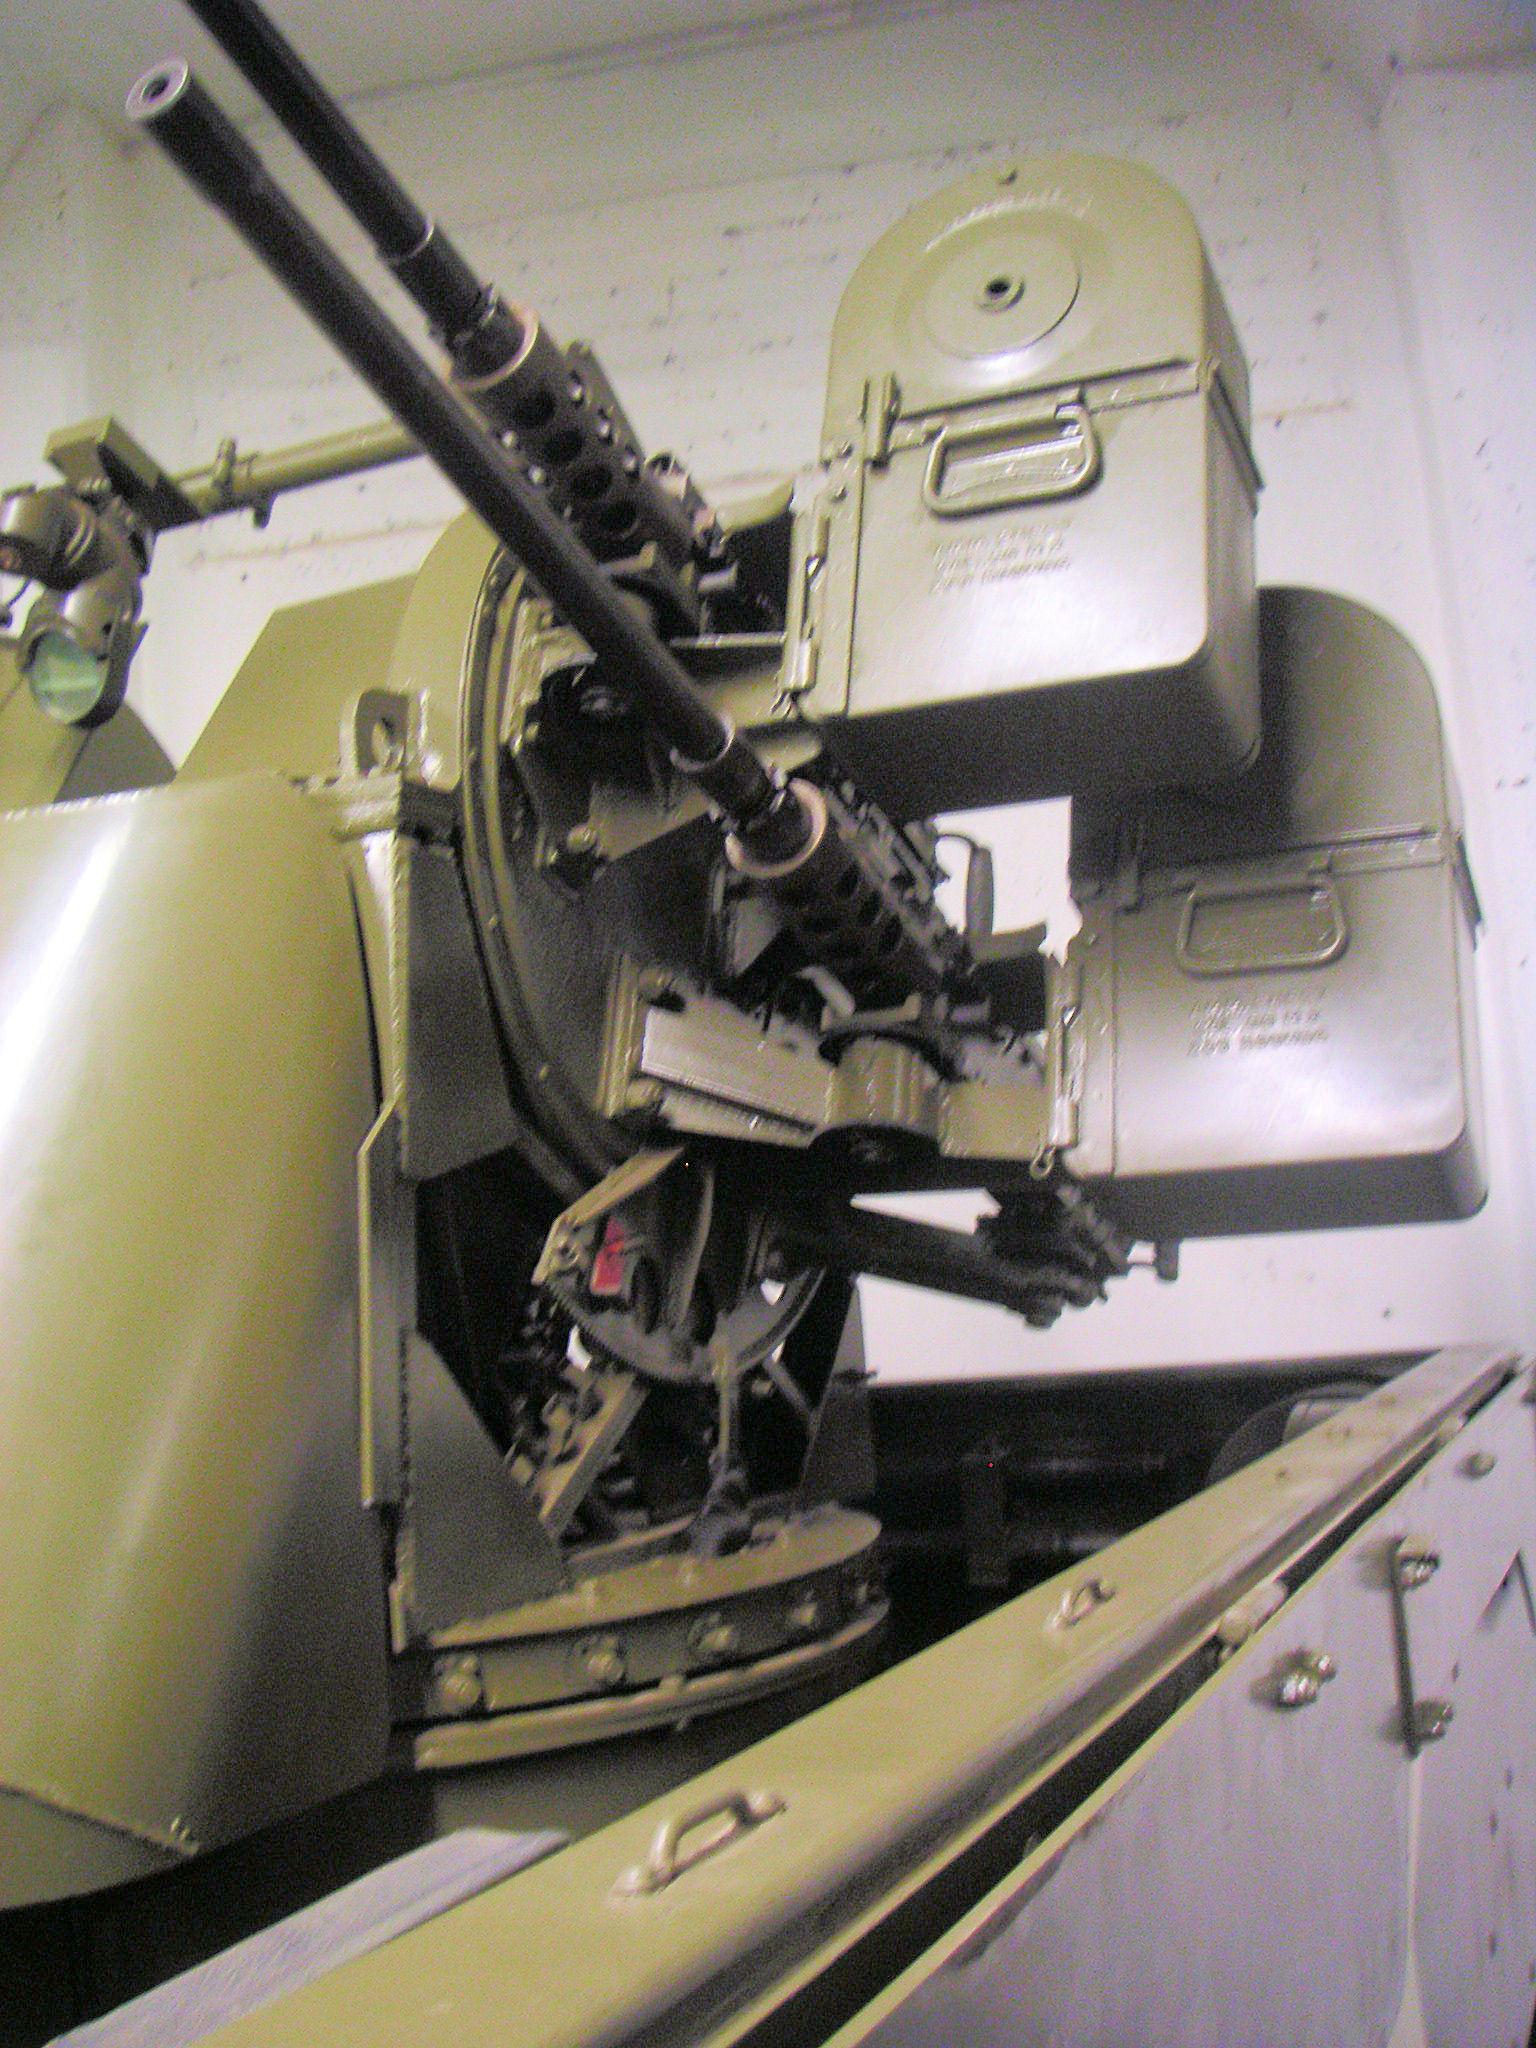 1943 M 16 HALF-TRACK  M-16 M16_half-track_07_of_14